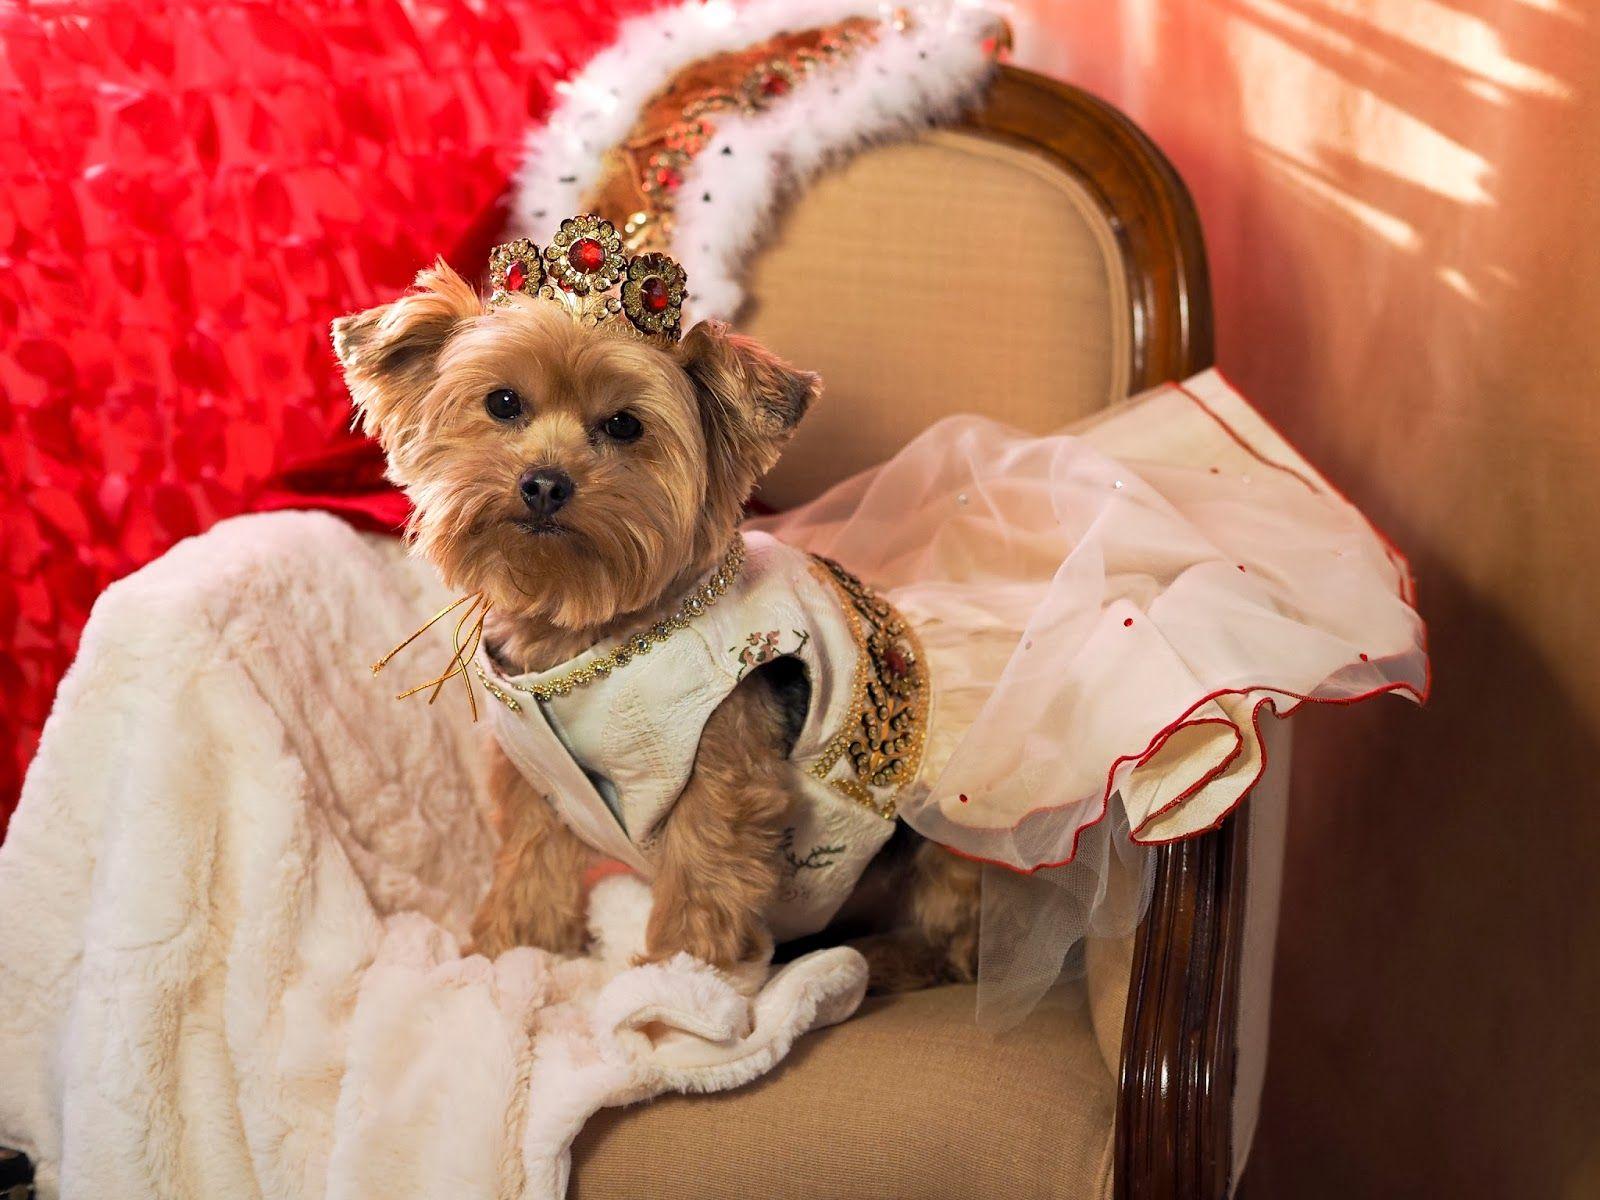 Happy Valentine's Day from The Doggie Nanny! Valentines